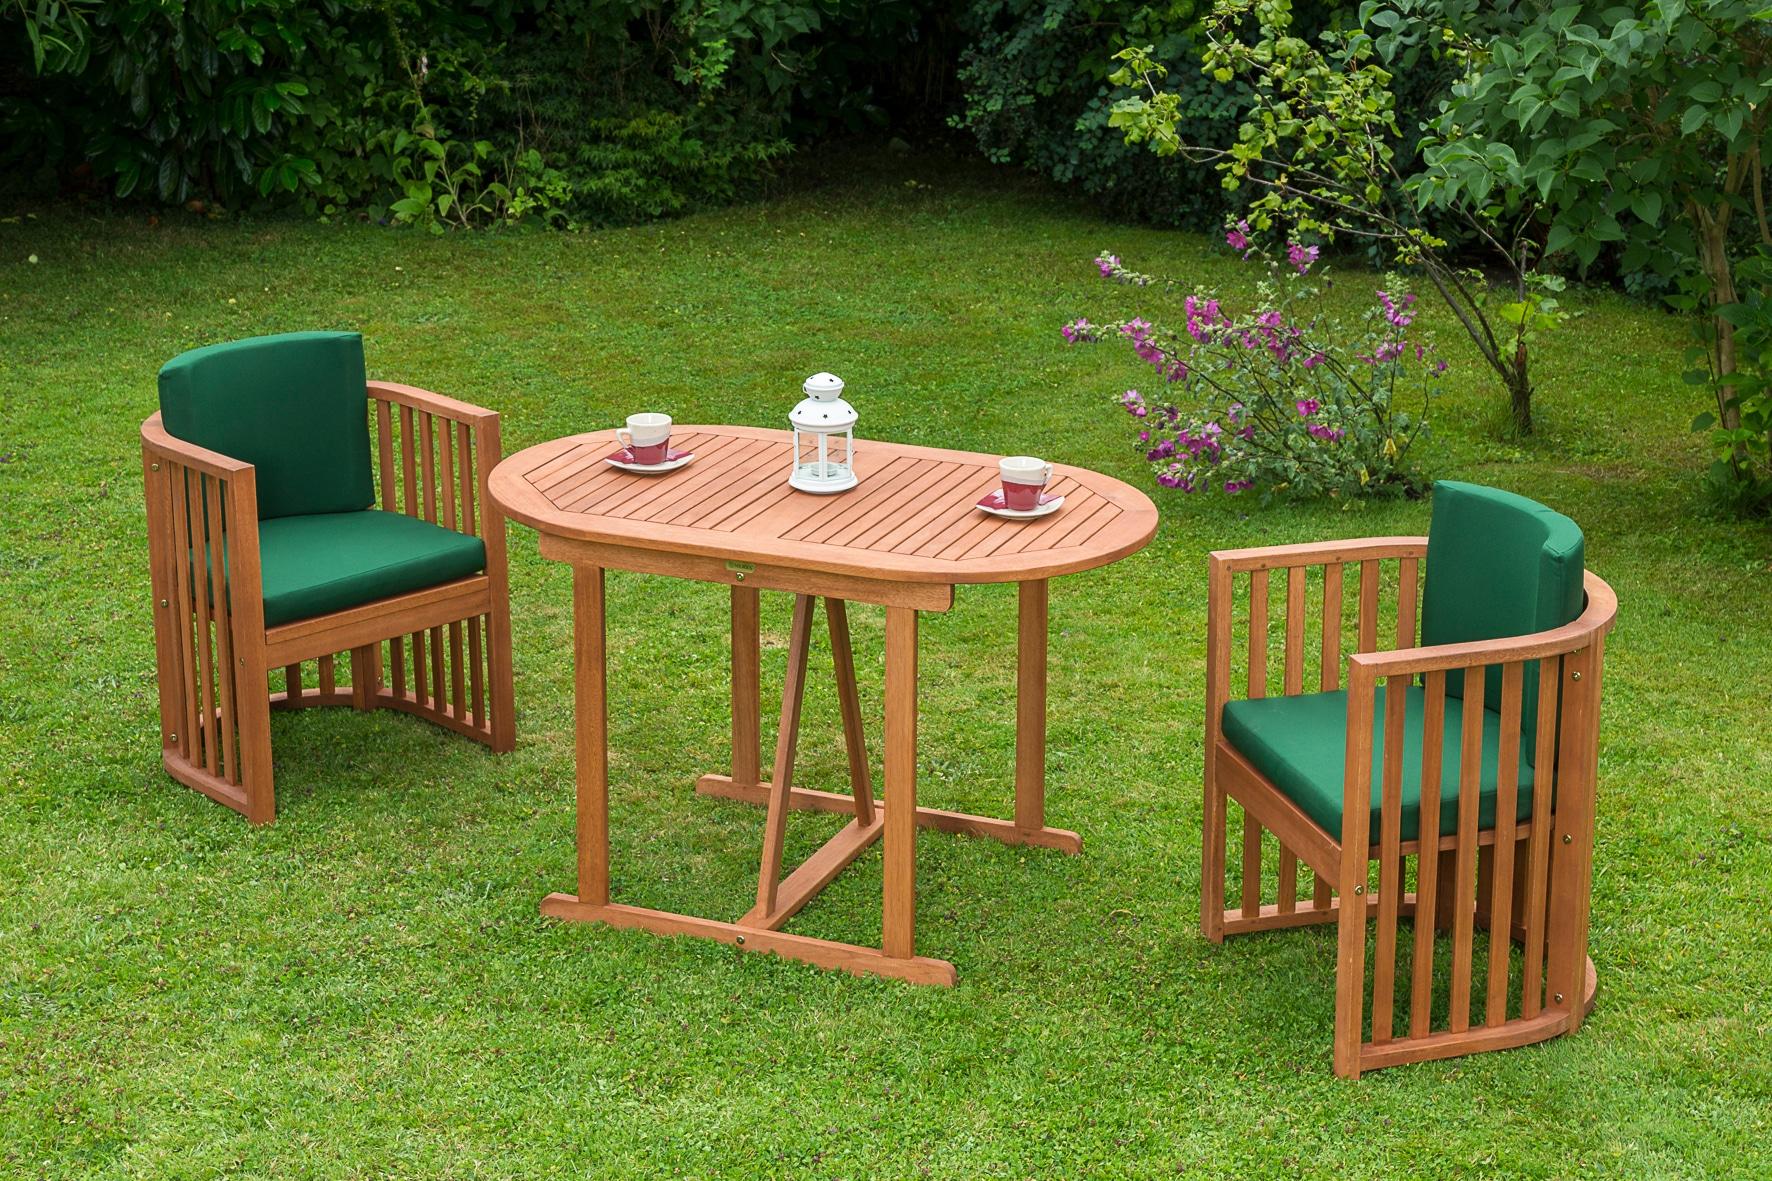 MERXX Gartenmöbelset Brasilia 3-tlg 2 Sessel Tisch 120x70 cm Eukalyptus braun